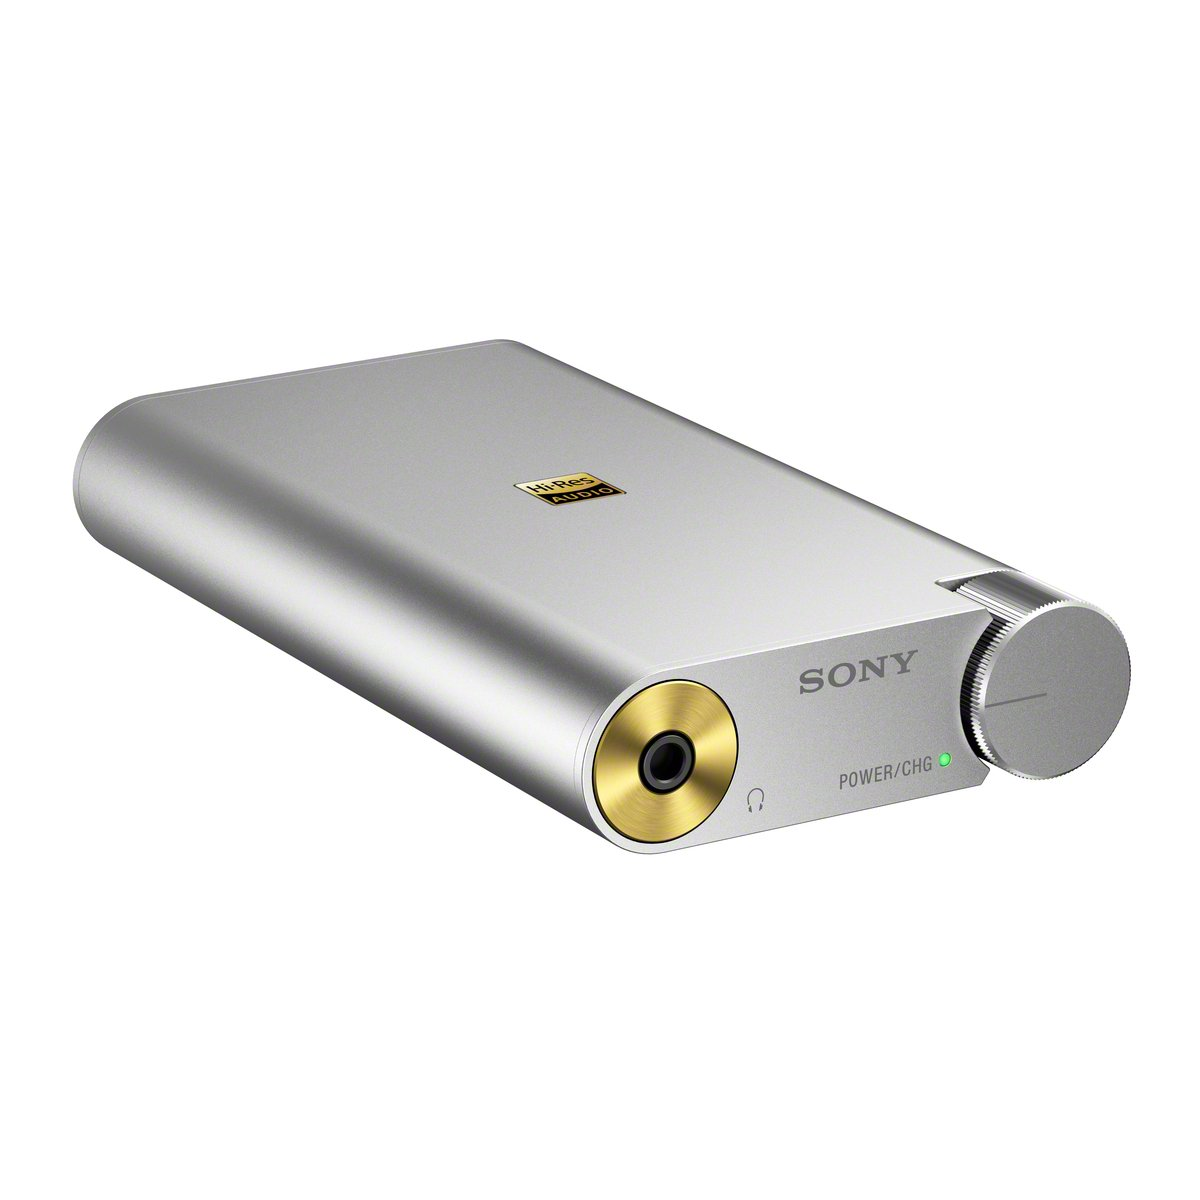 Sony PHA1A Portable Hi-Res DAC/Headphone Amplifier, Silver